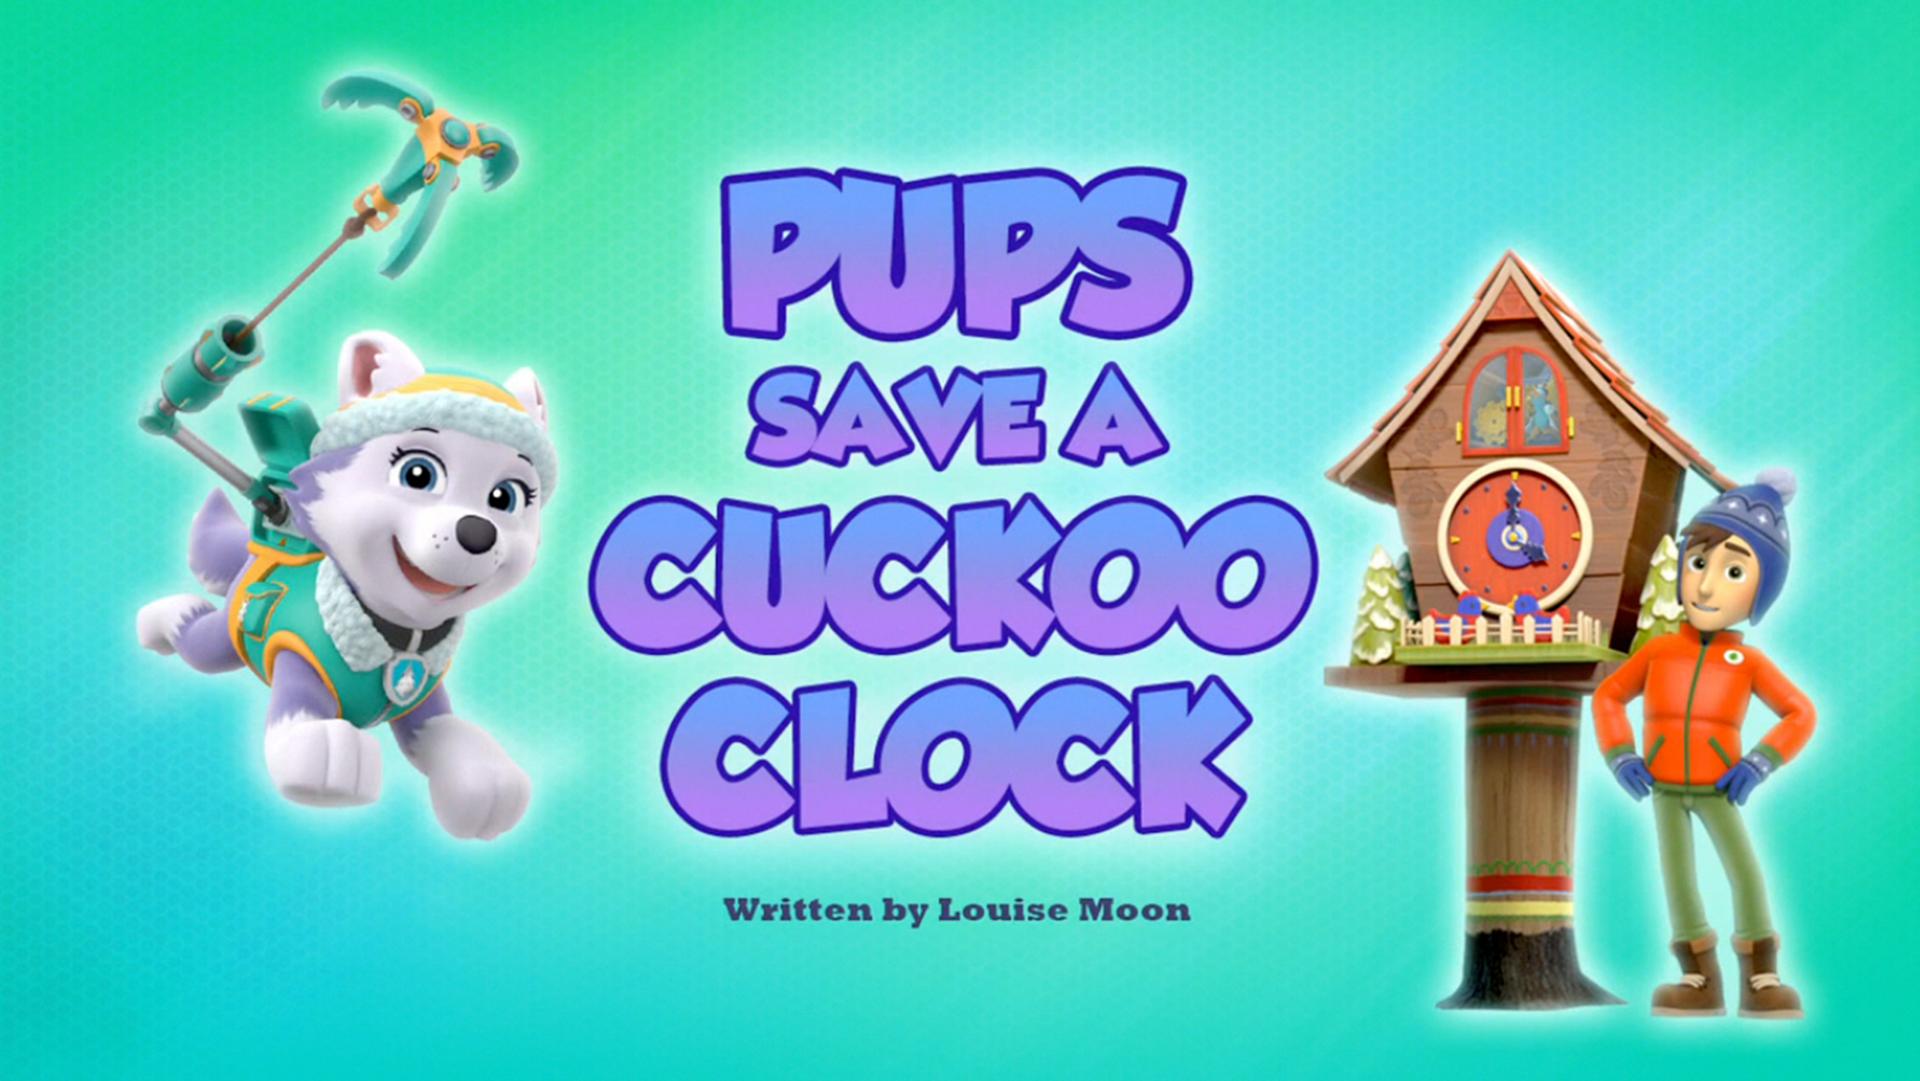 Pups Save a Cuckoo Clock